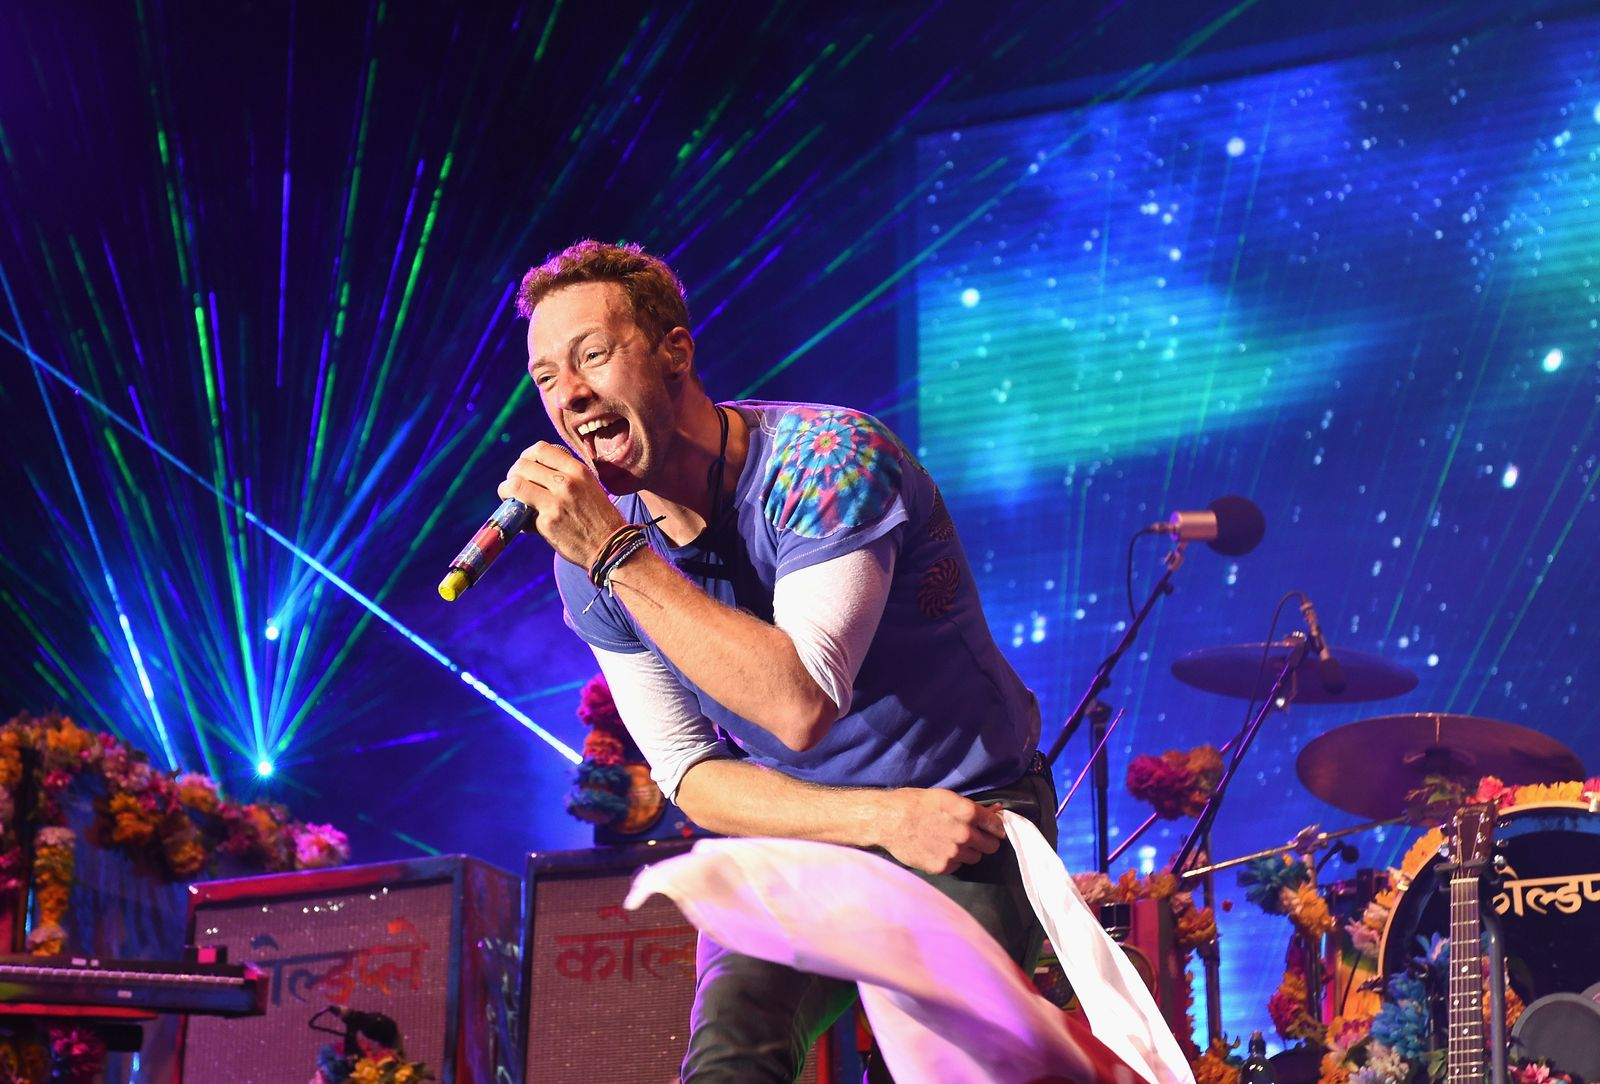 Coldplay/ Chris Martin